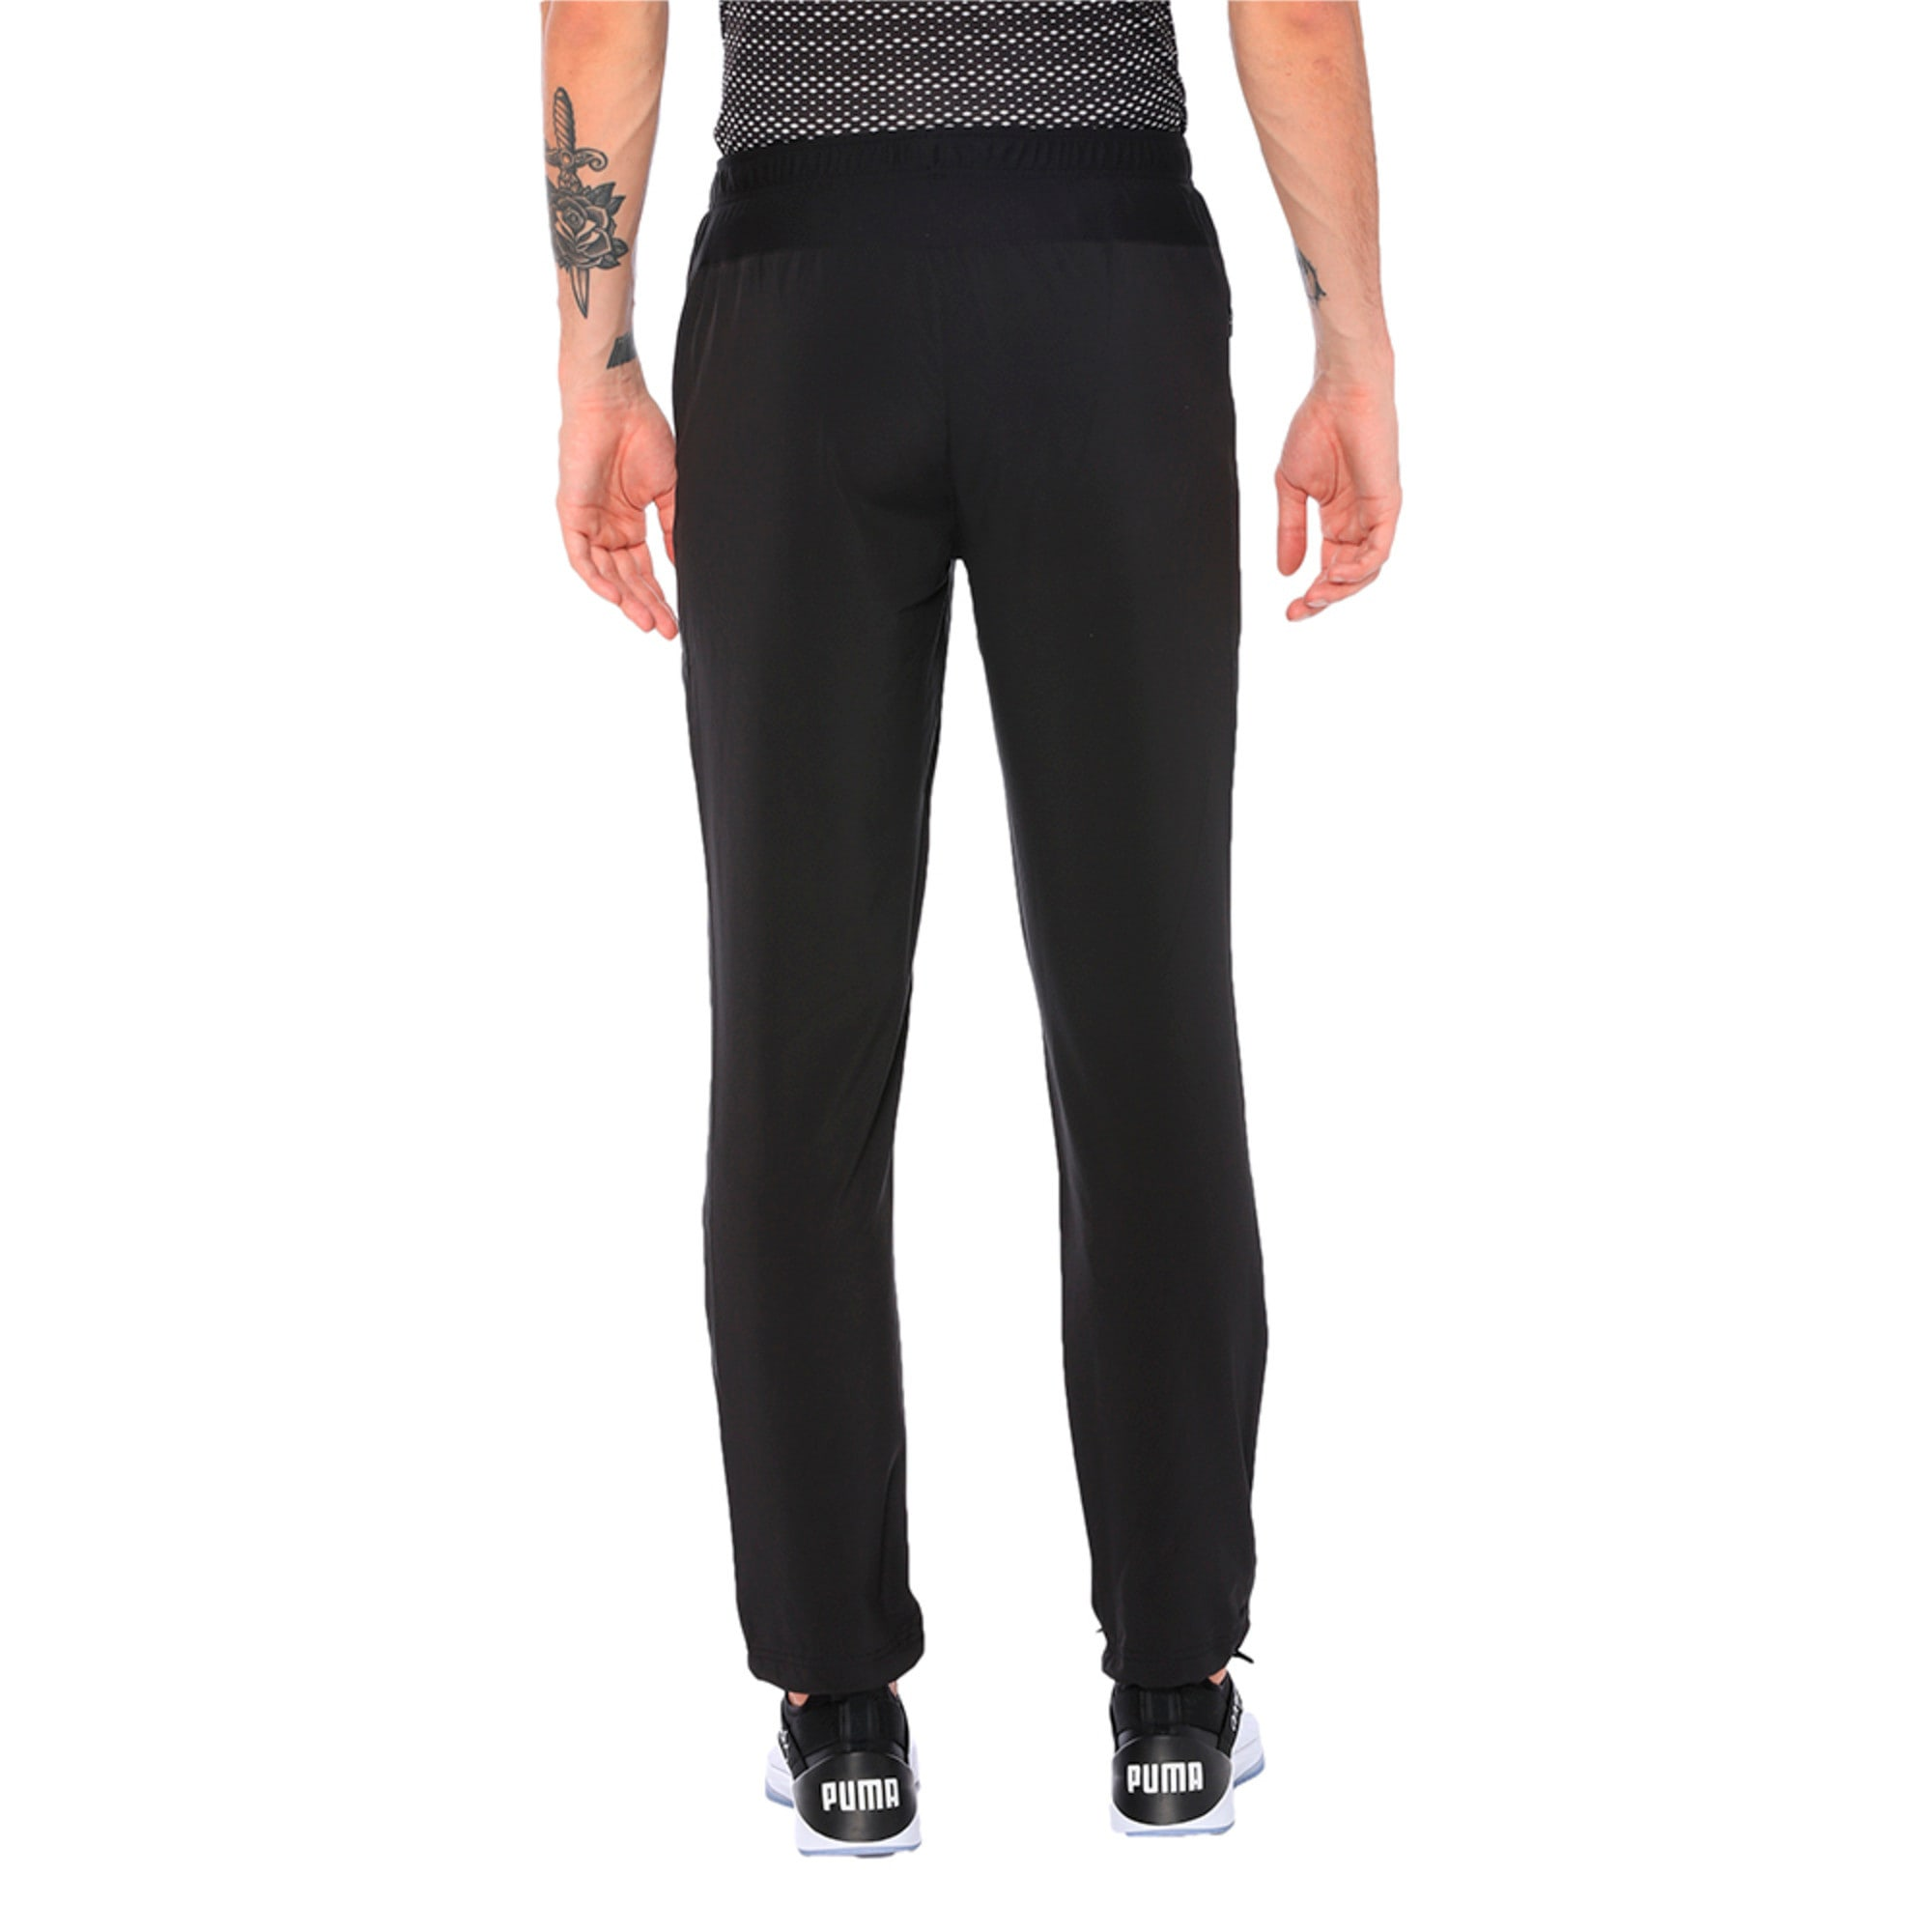 Thumbnail 5 of one8 VK Men's Active Pants, Puma Black, medium-IND